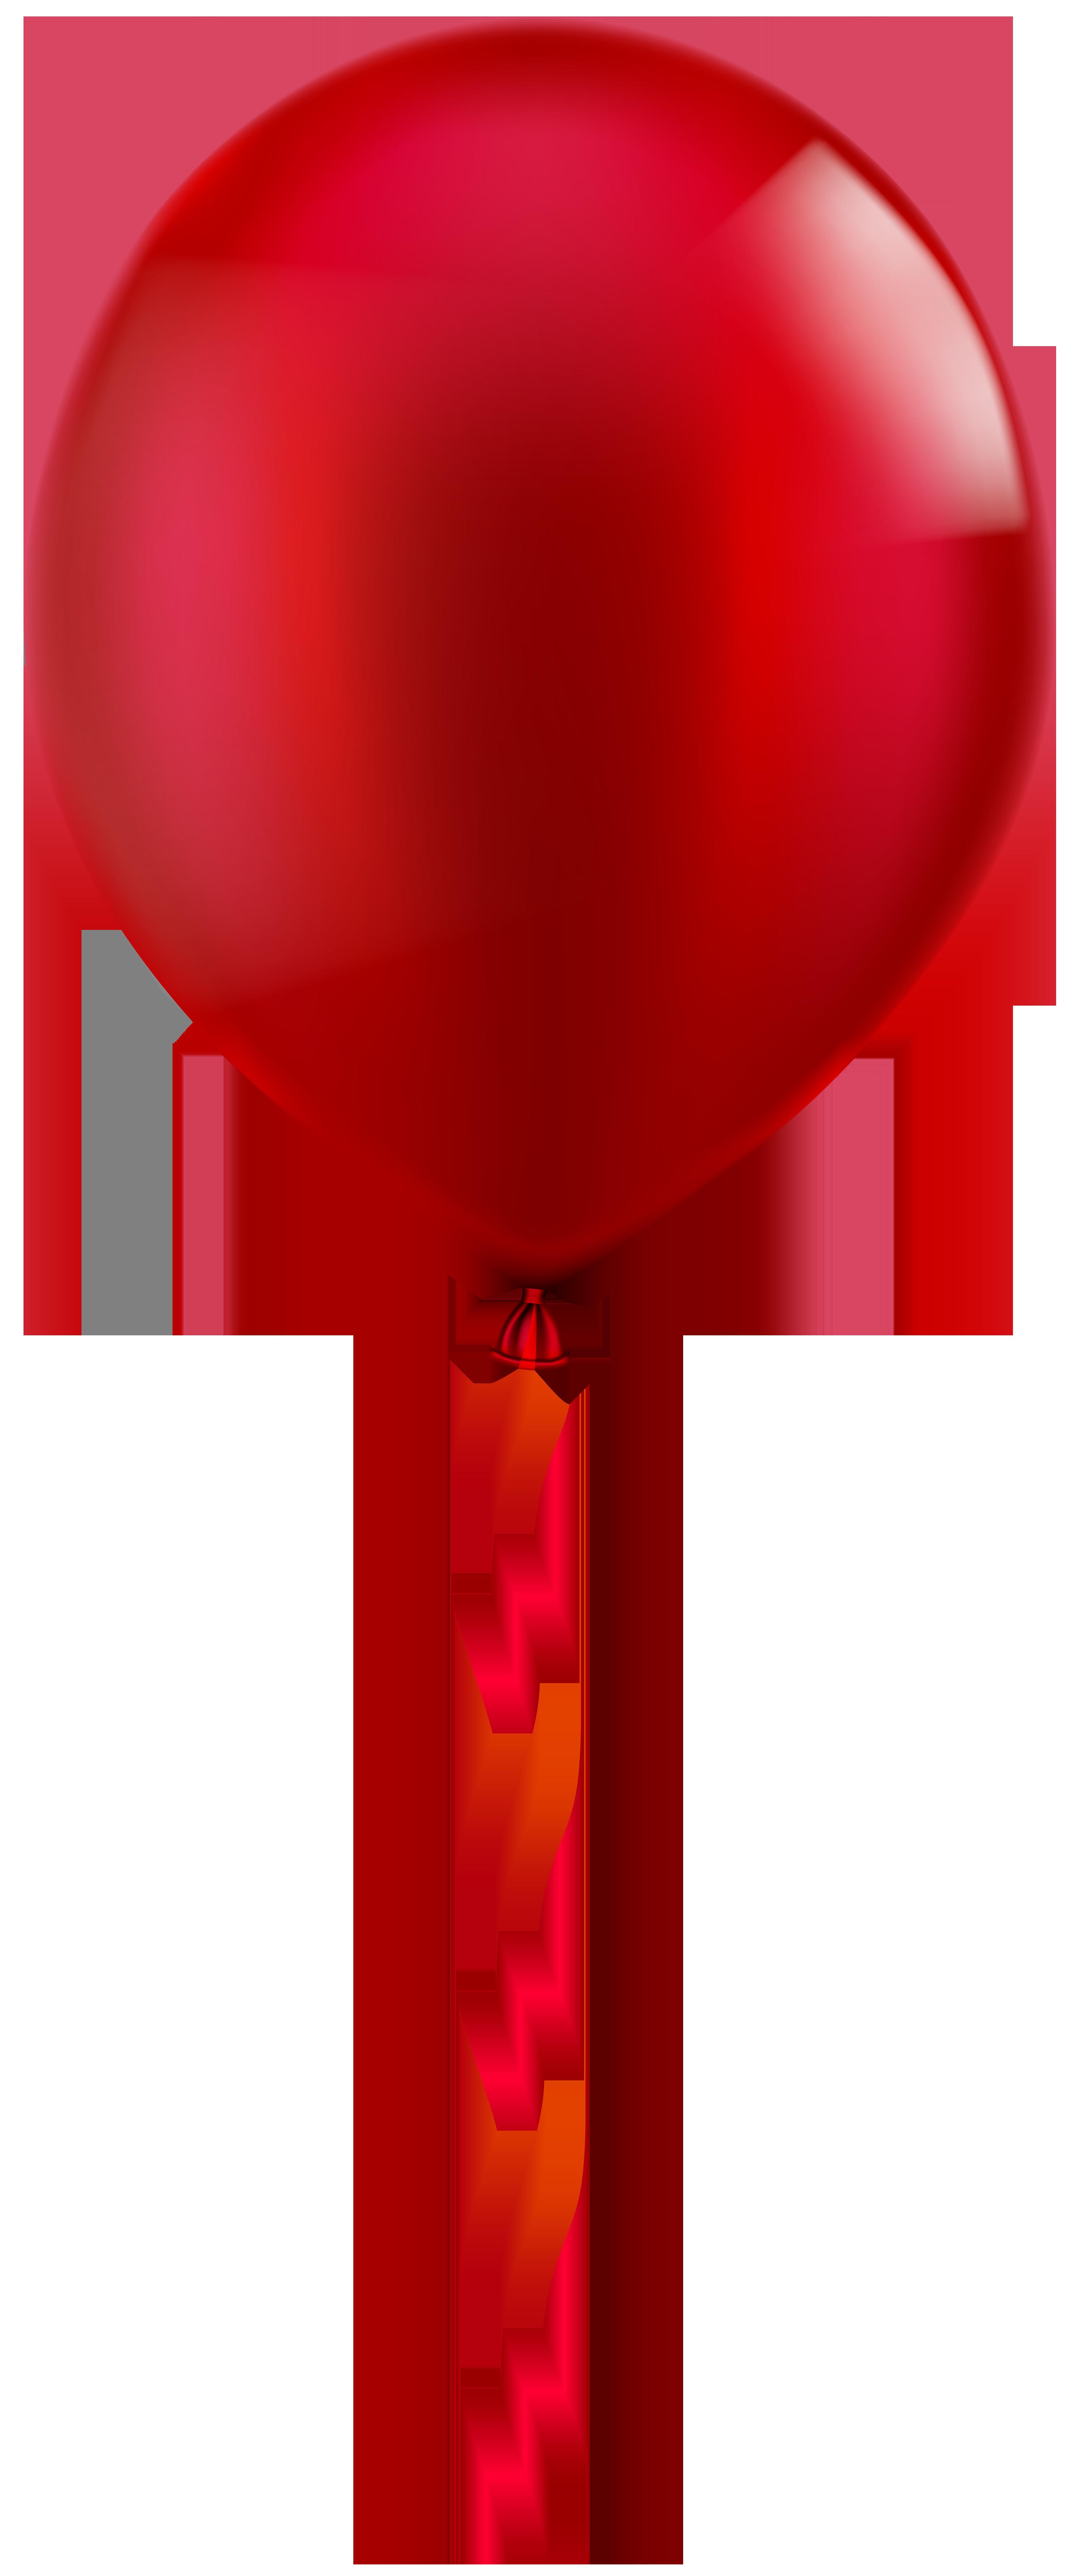 Single red balloon.